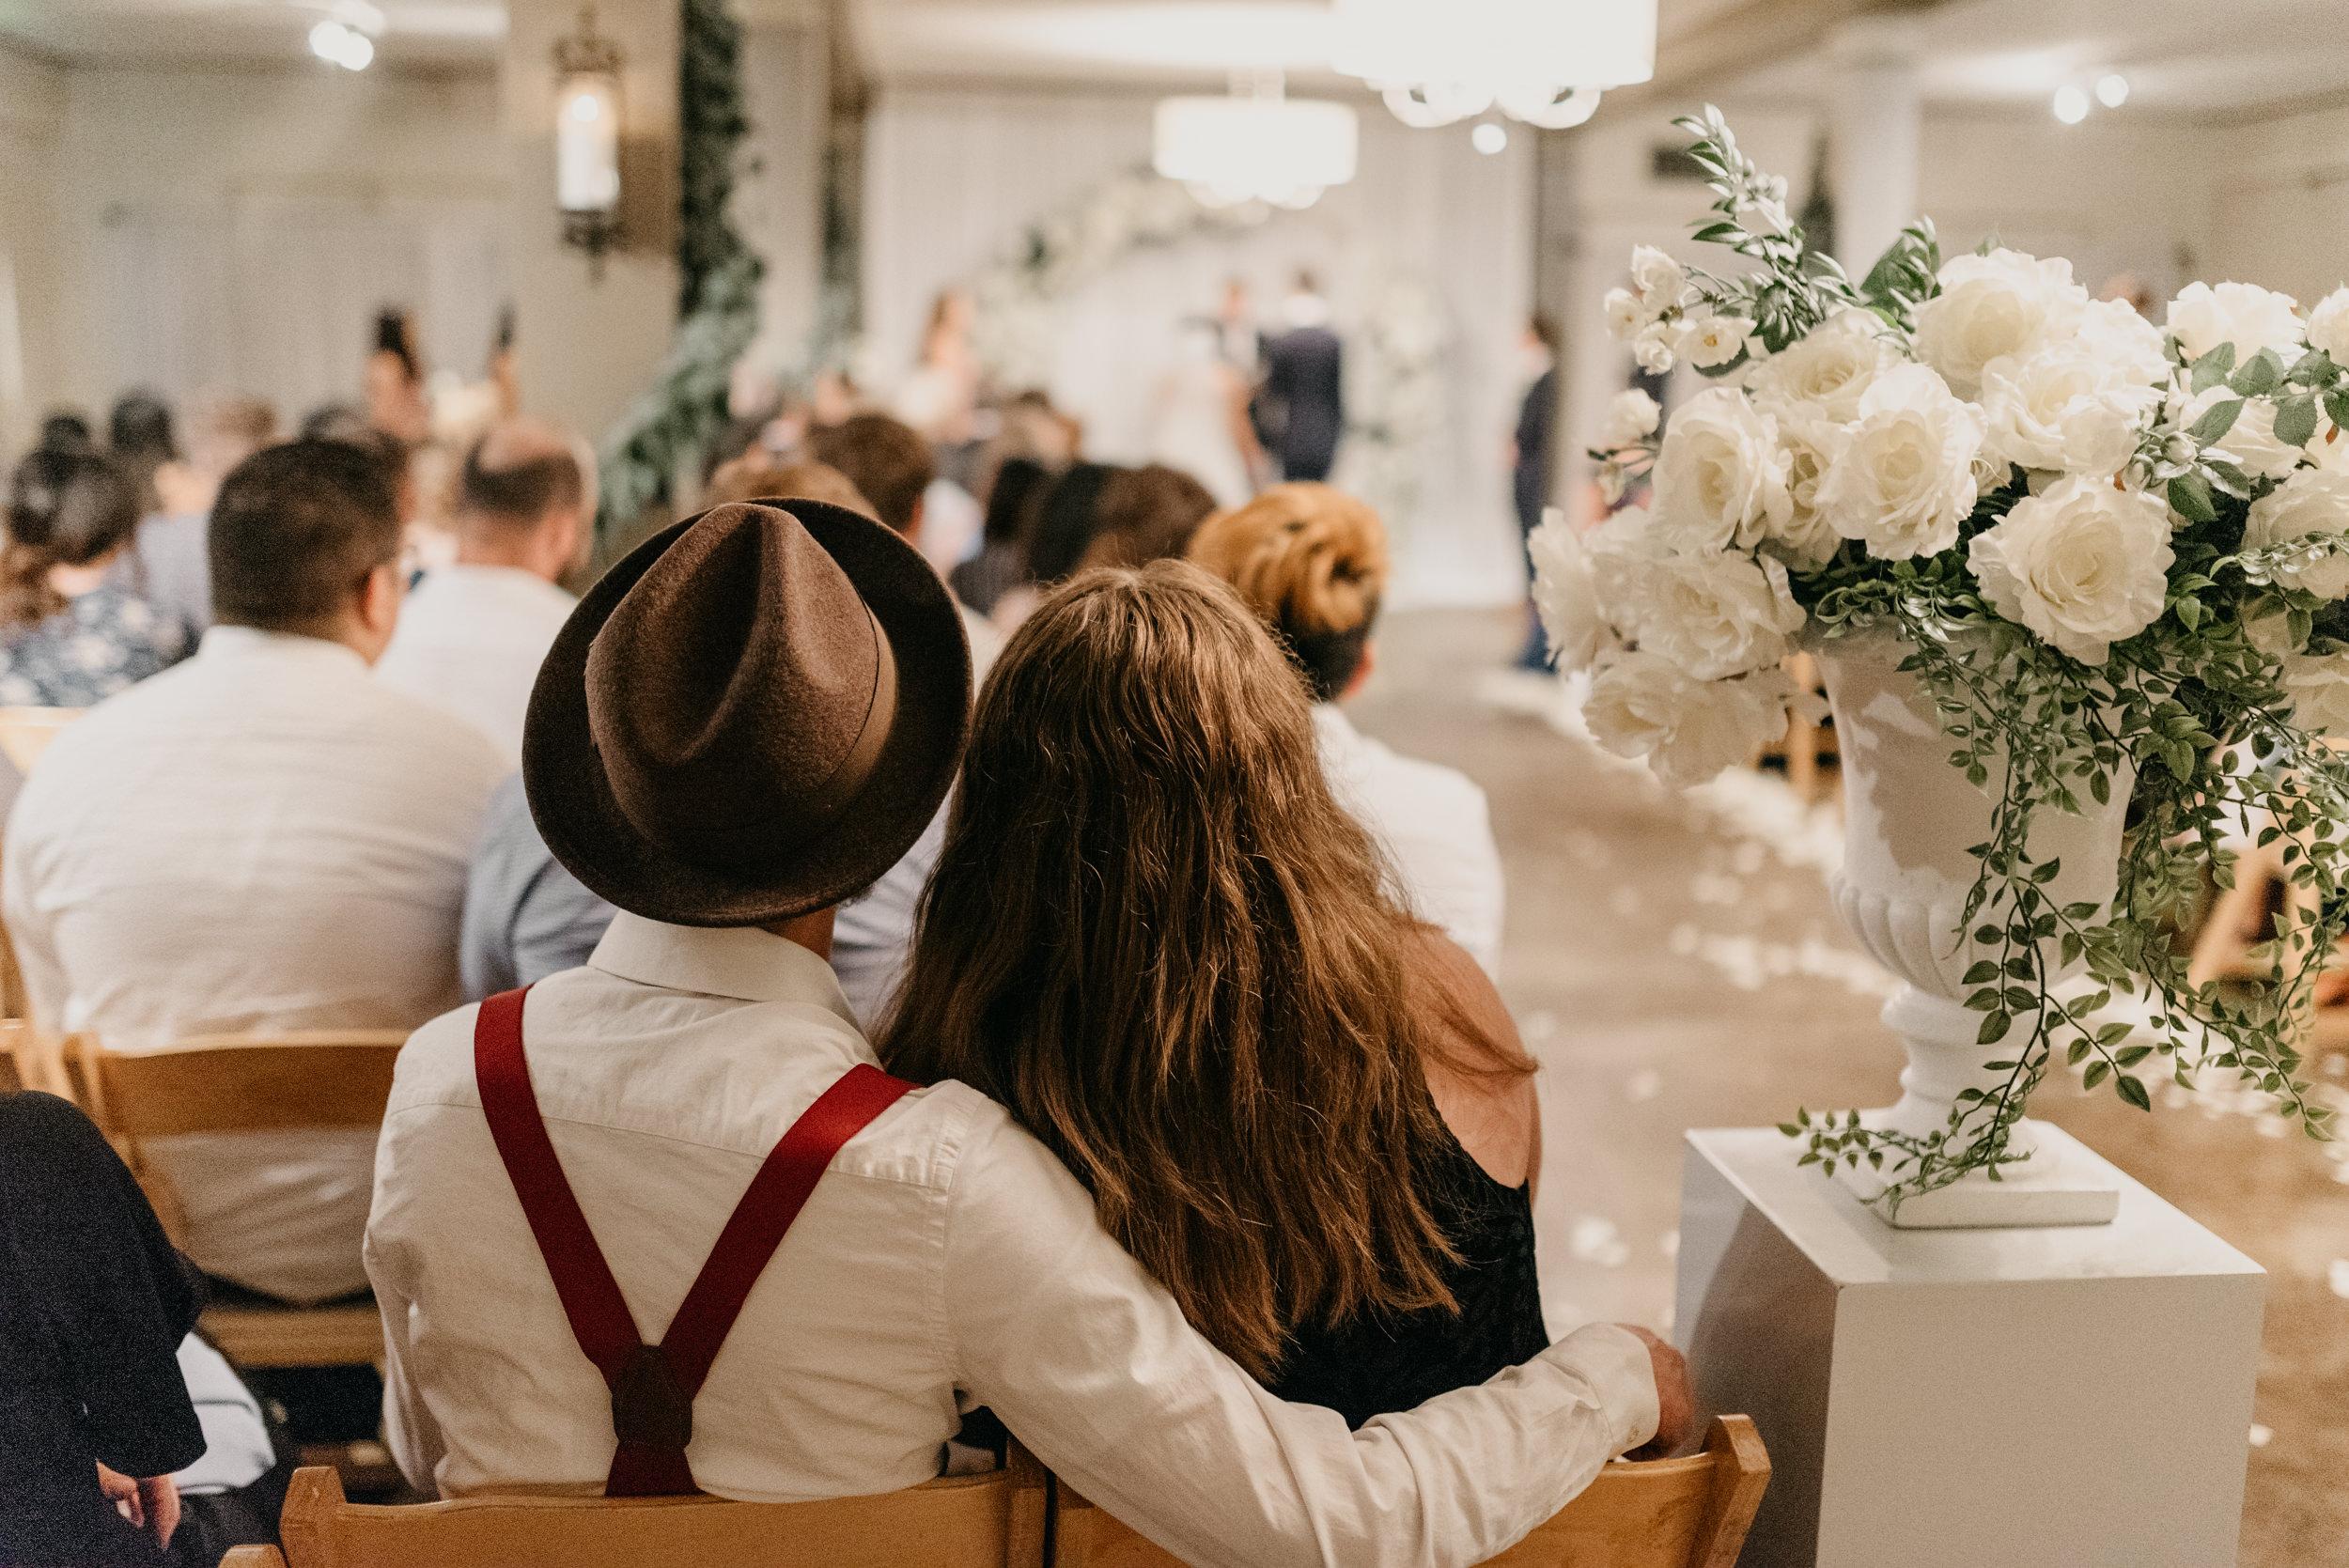 79-ceremony-west-end-ballroom-portland-wedding-venue-7932.jpg